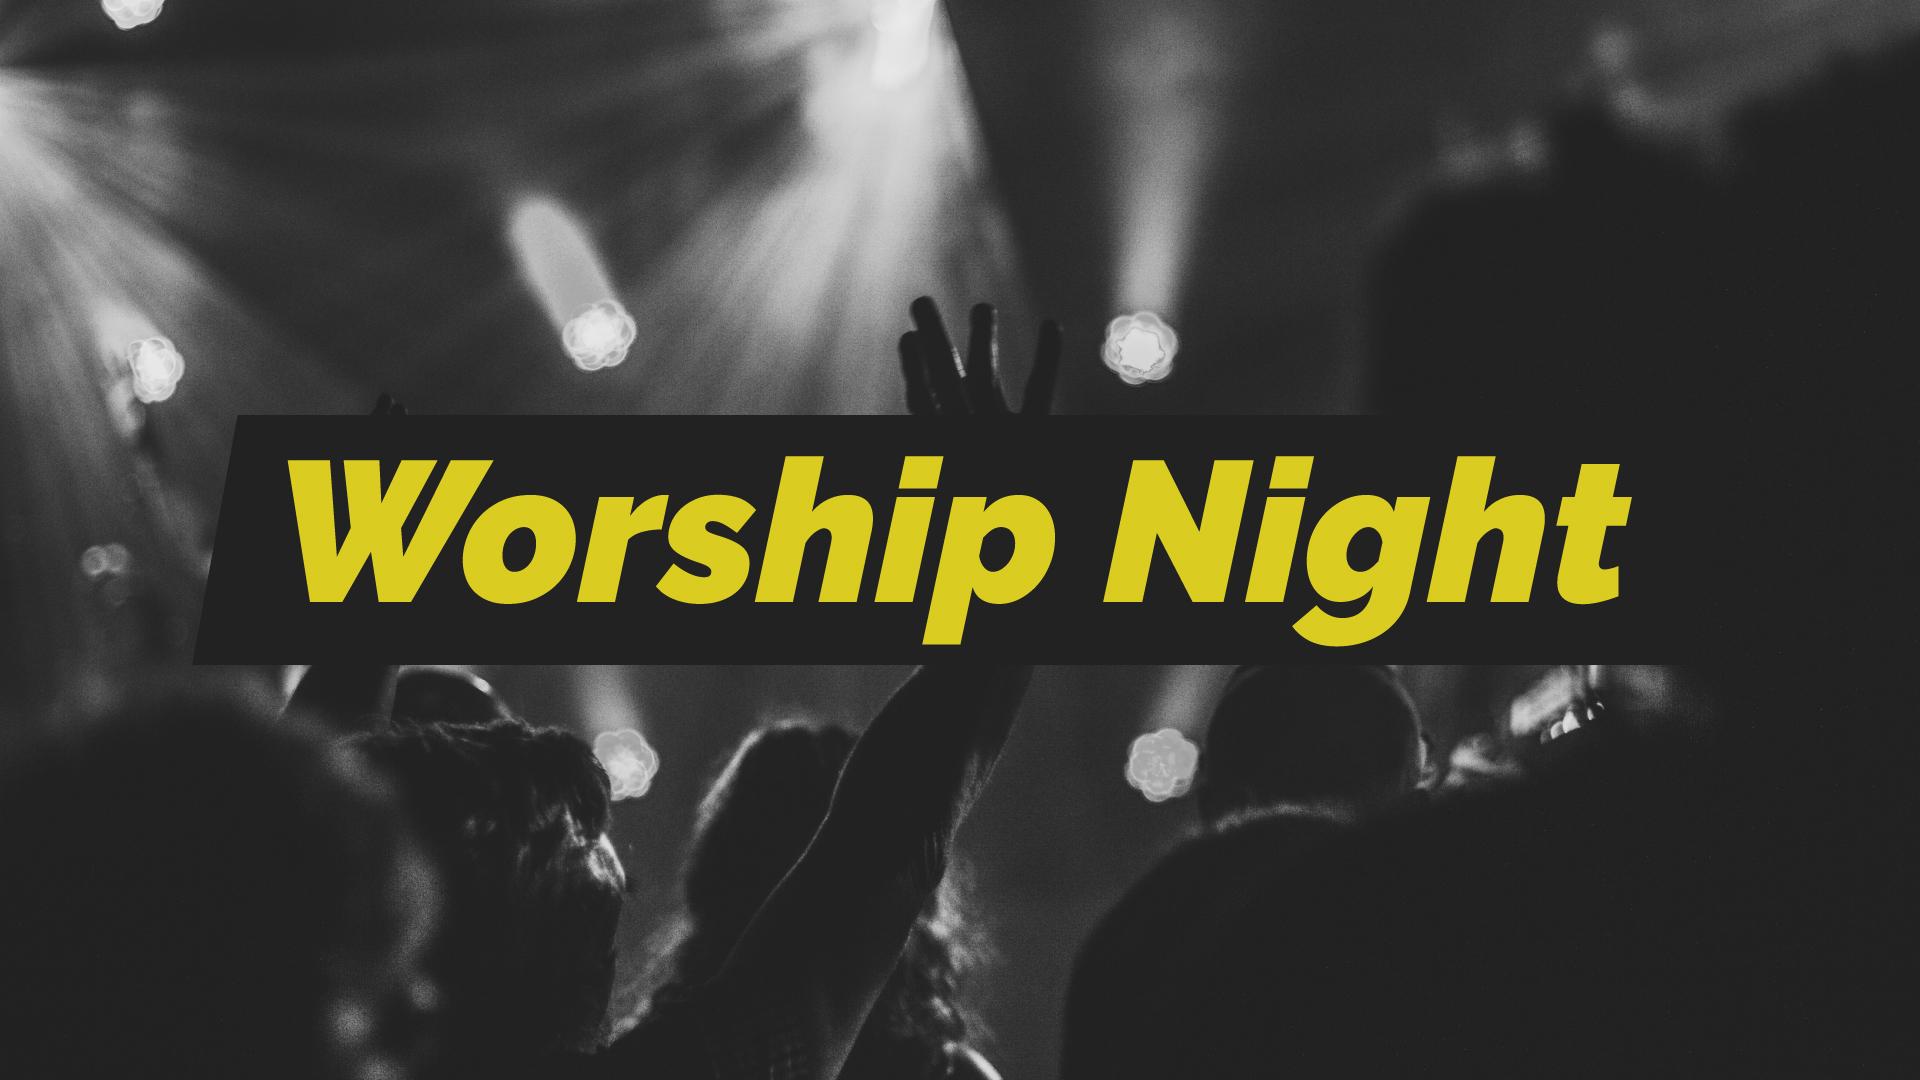 Worship-Night-blank.jpg